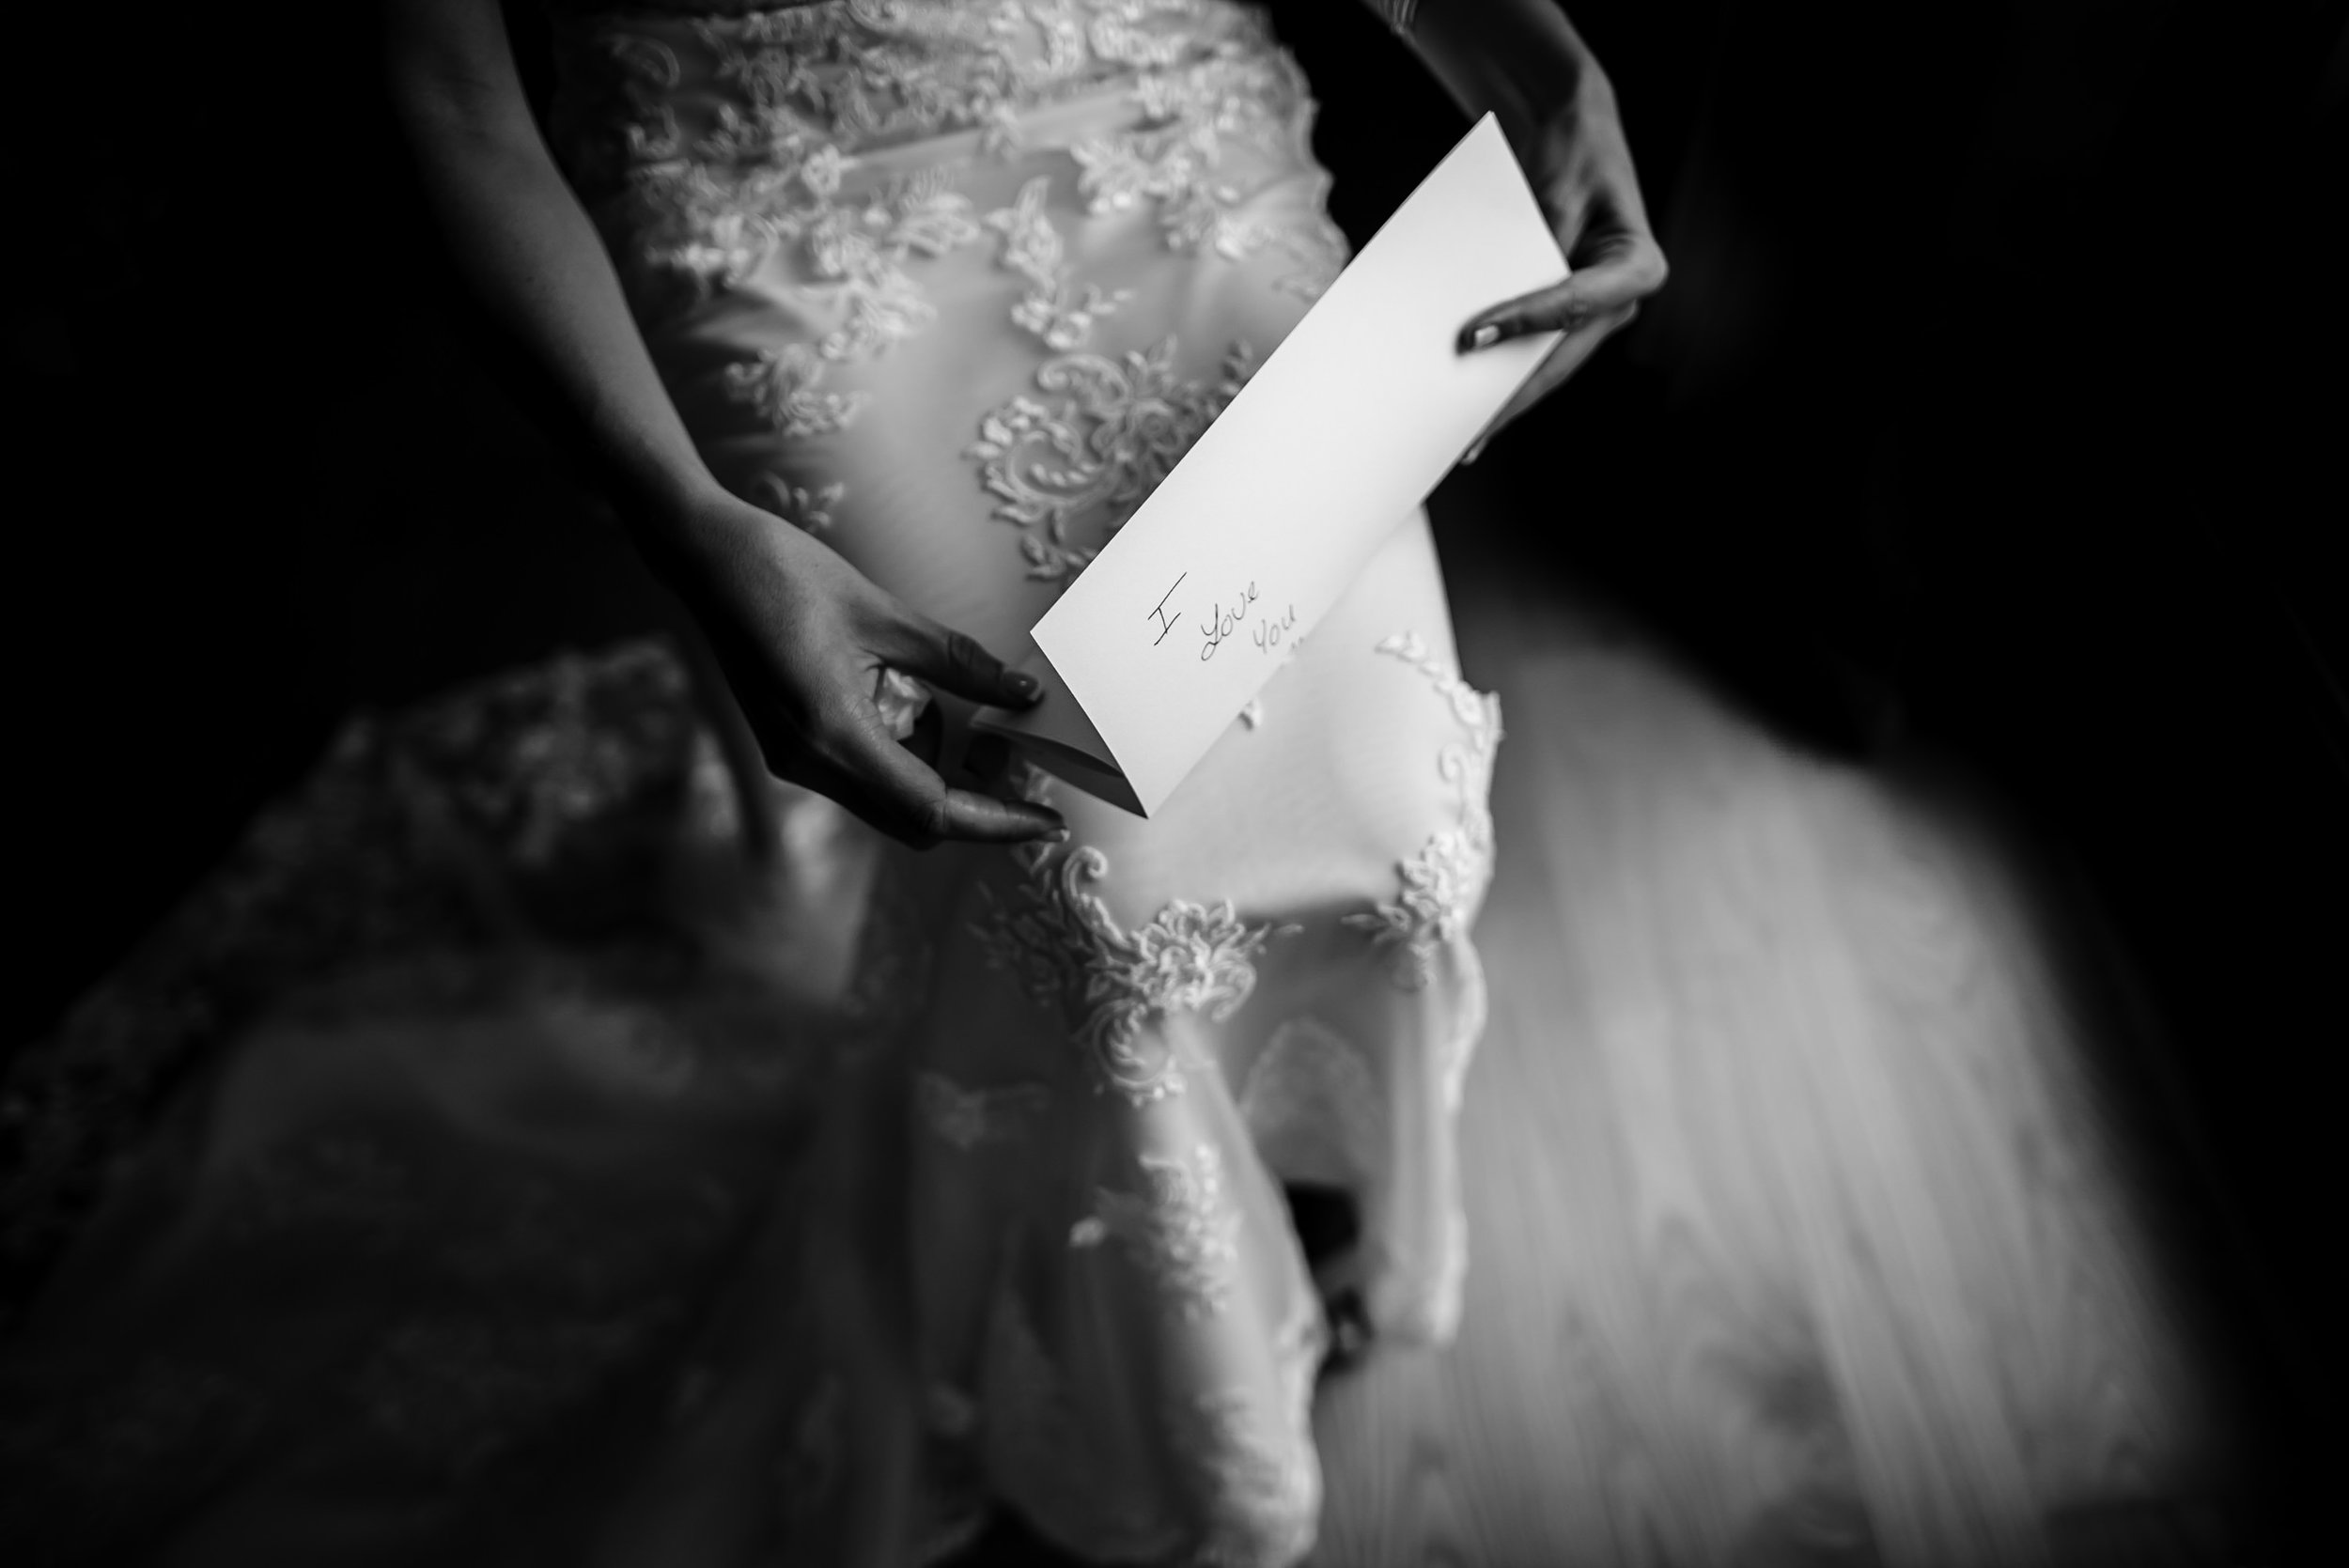 New-York-Wedding-Photographer-arius-organic-romantic-non-cheesy-51.jpg